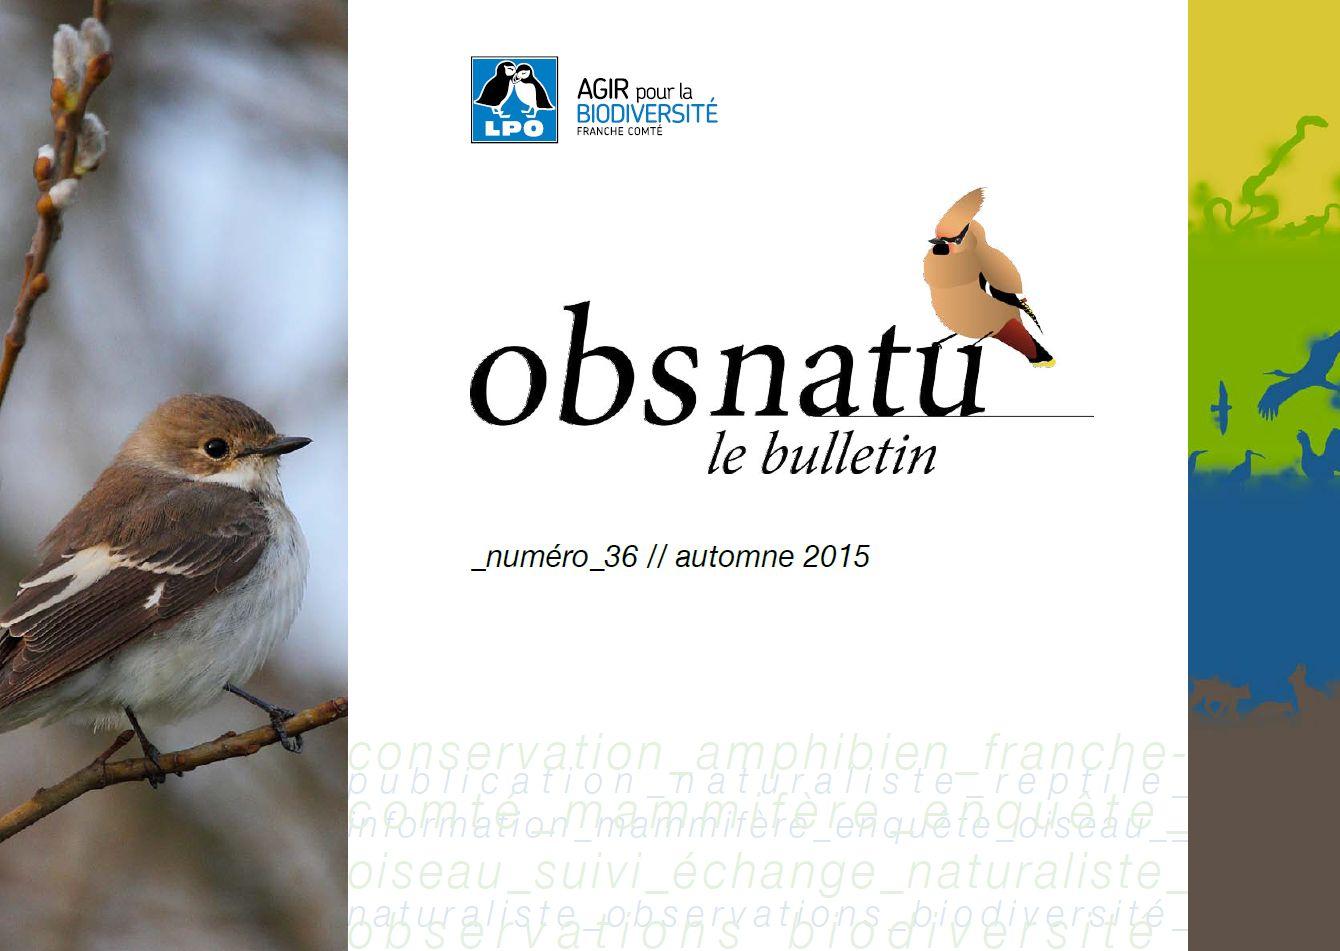 http://files.biolovision.net/franche-comte.lpo.fr/userfiles/publications/Obsnatubulls/Obsnatun36automne2015couv.jpg